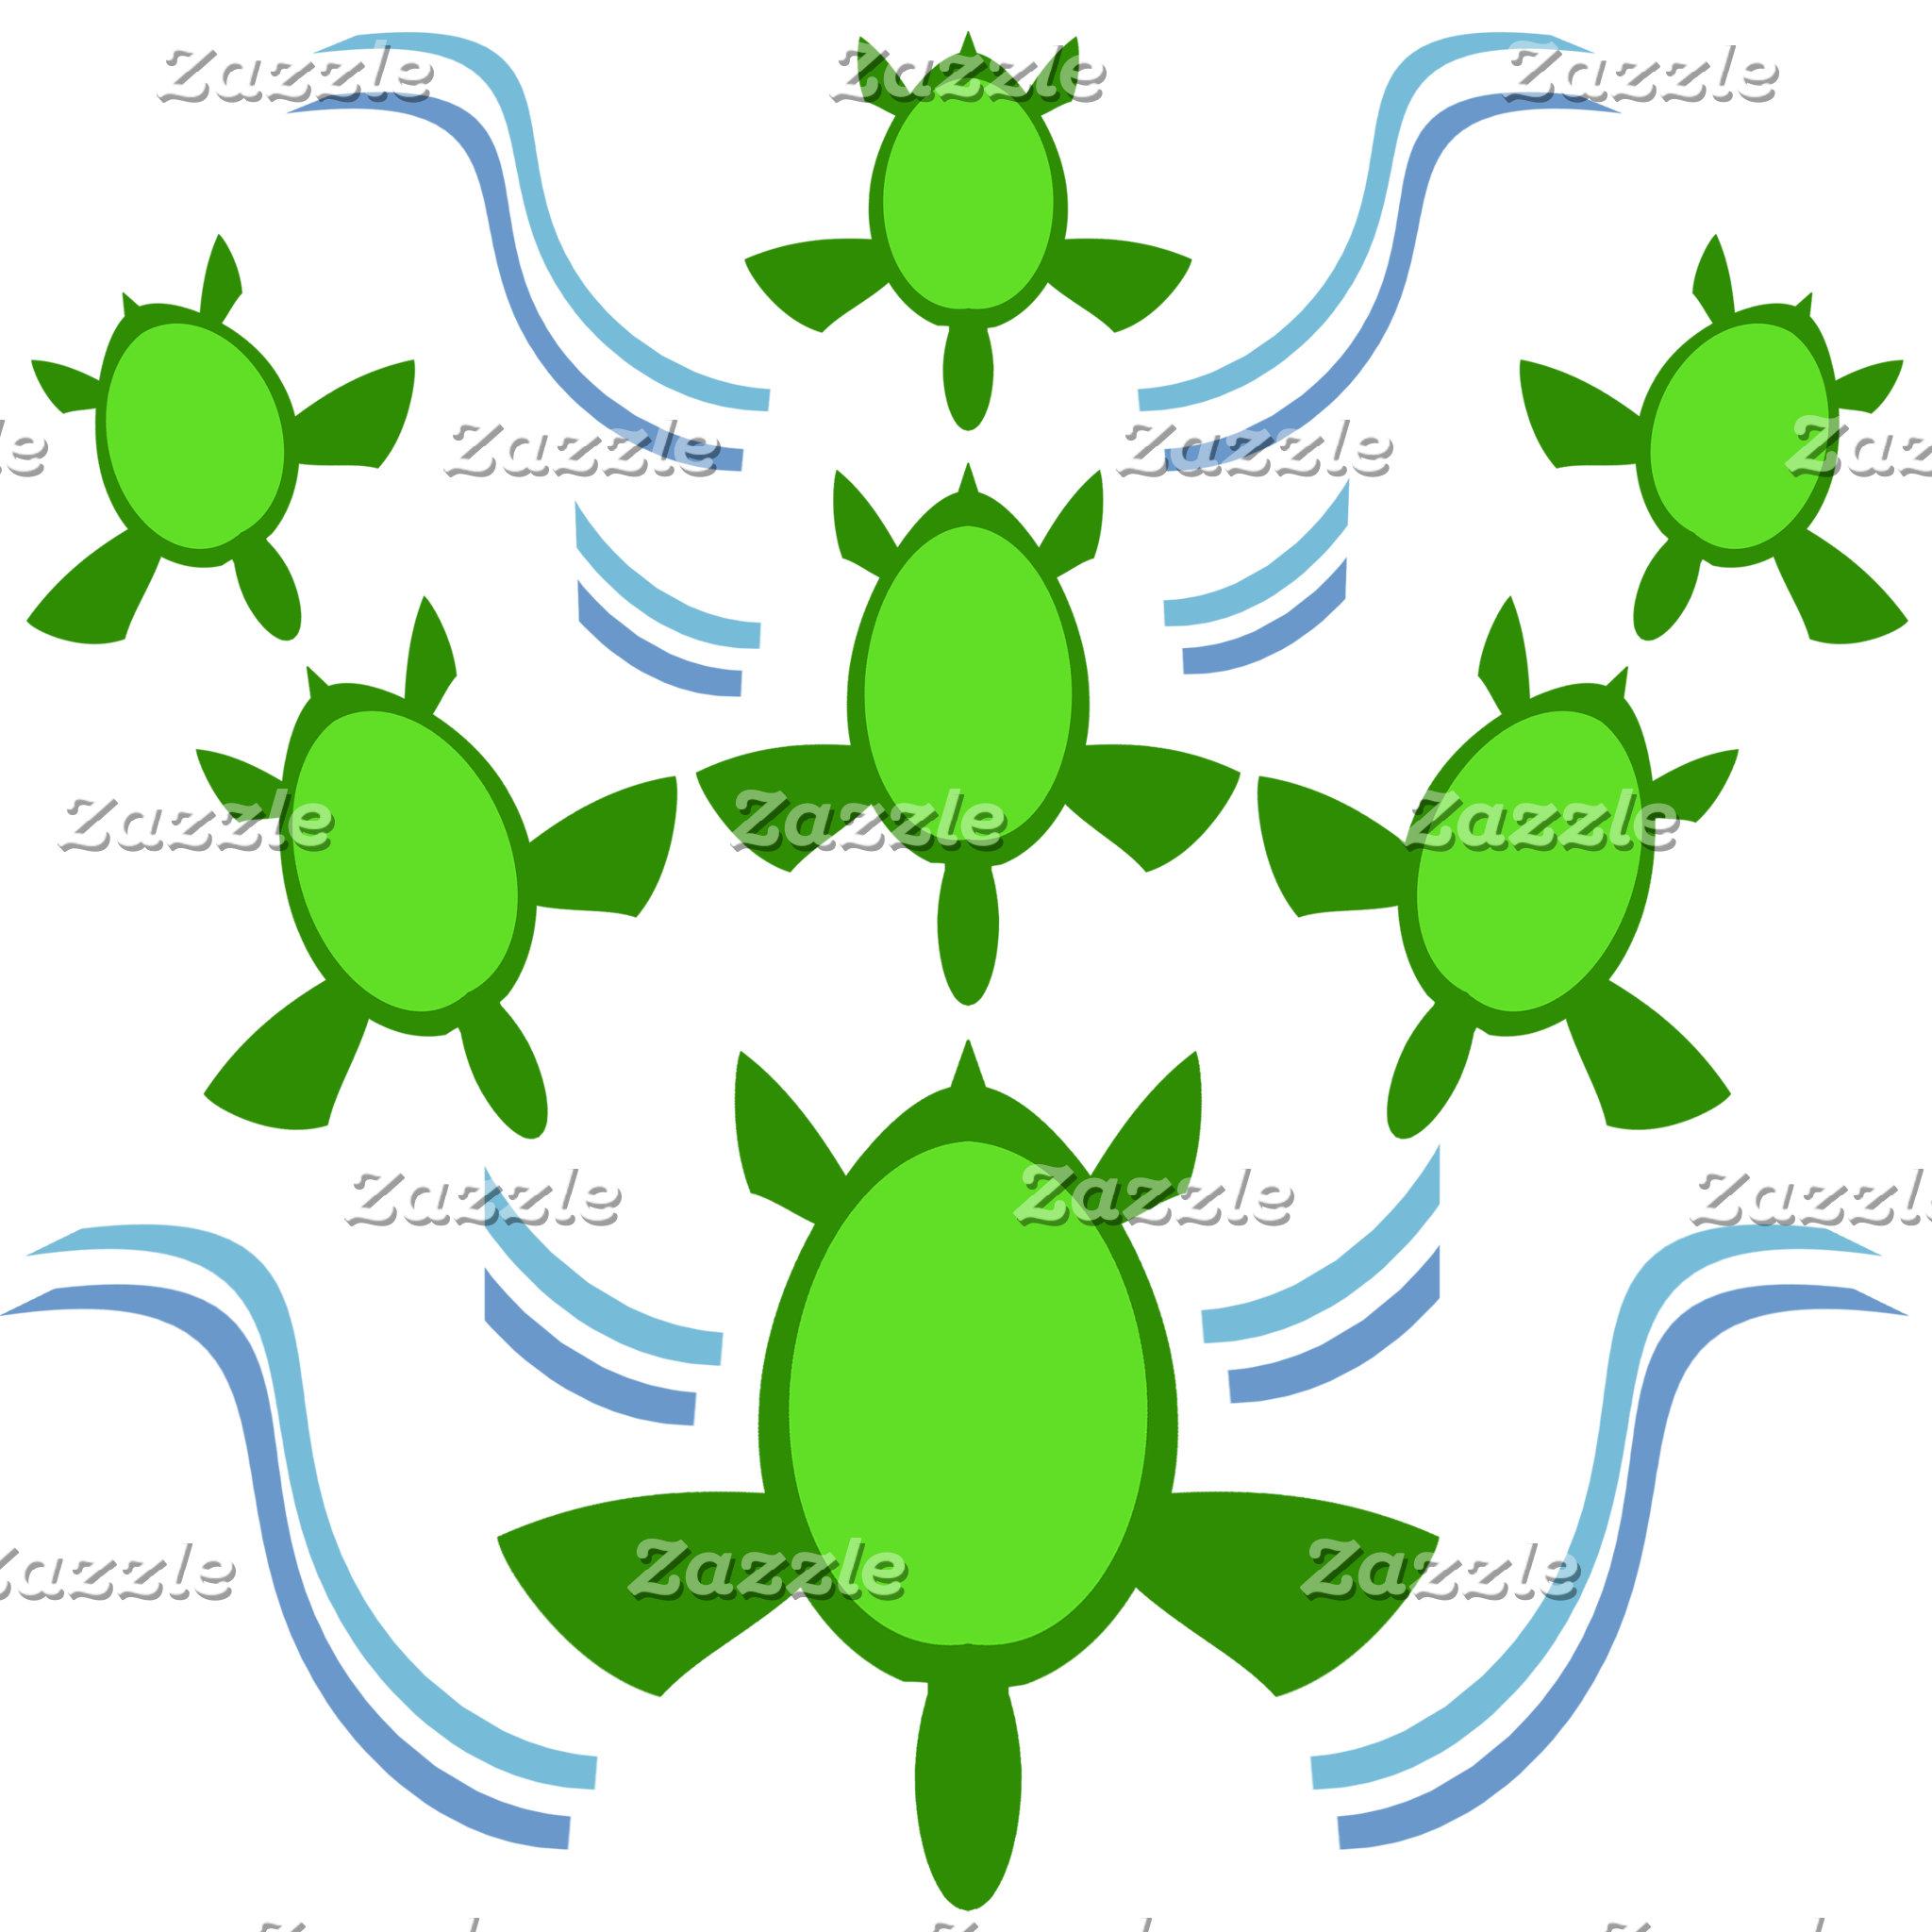 Follow the Turtles